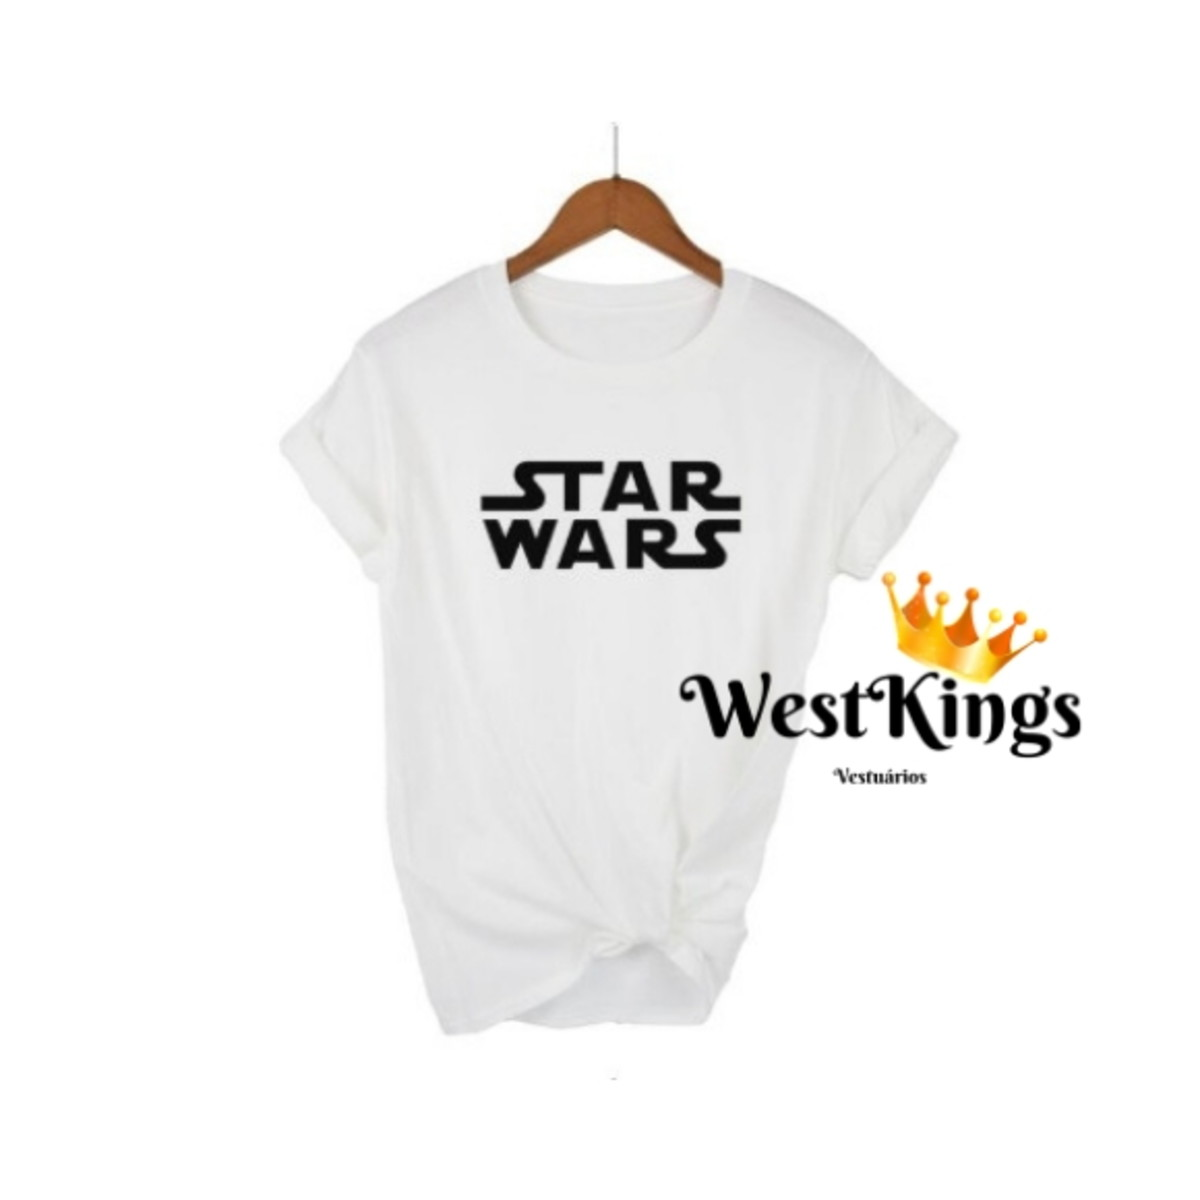 67586573d9 Camiseta Star Wars T-shirt Star Wars Blusa Filme Camisa no Elo7 ...